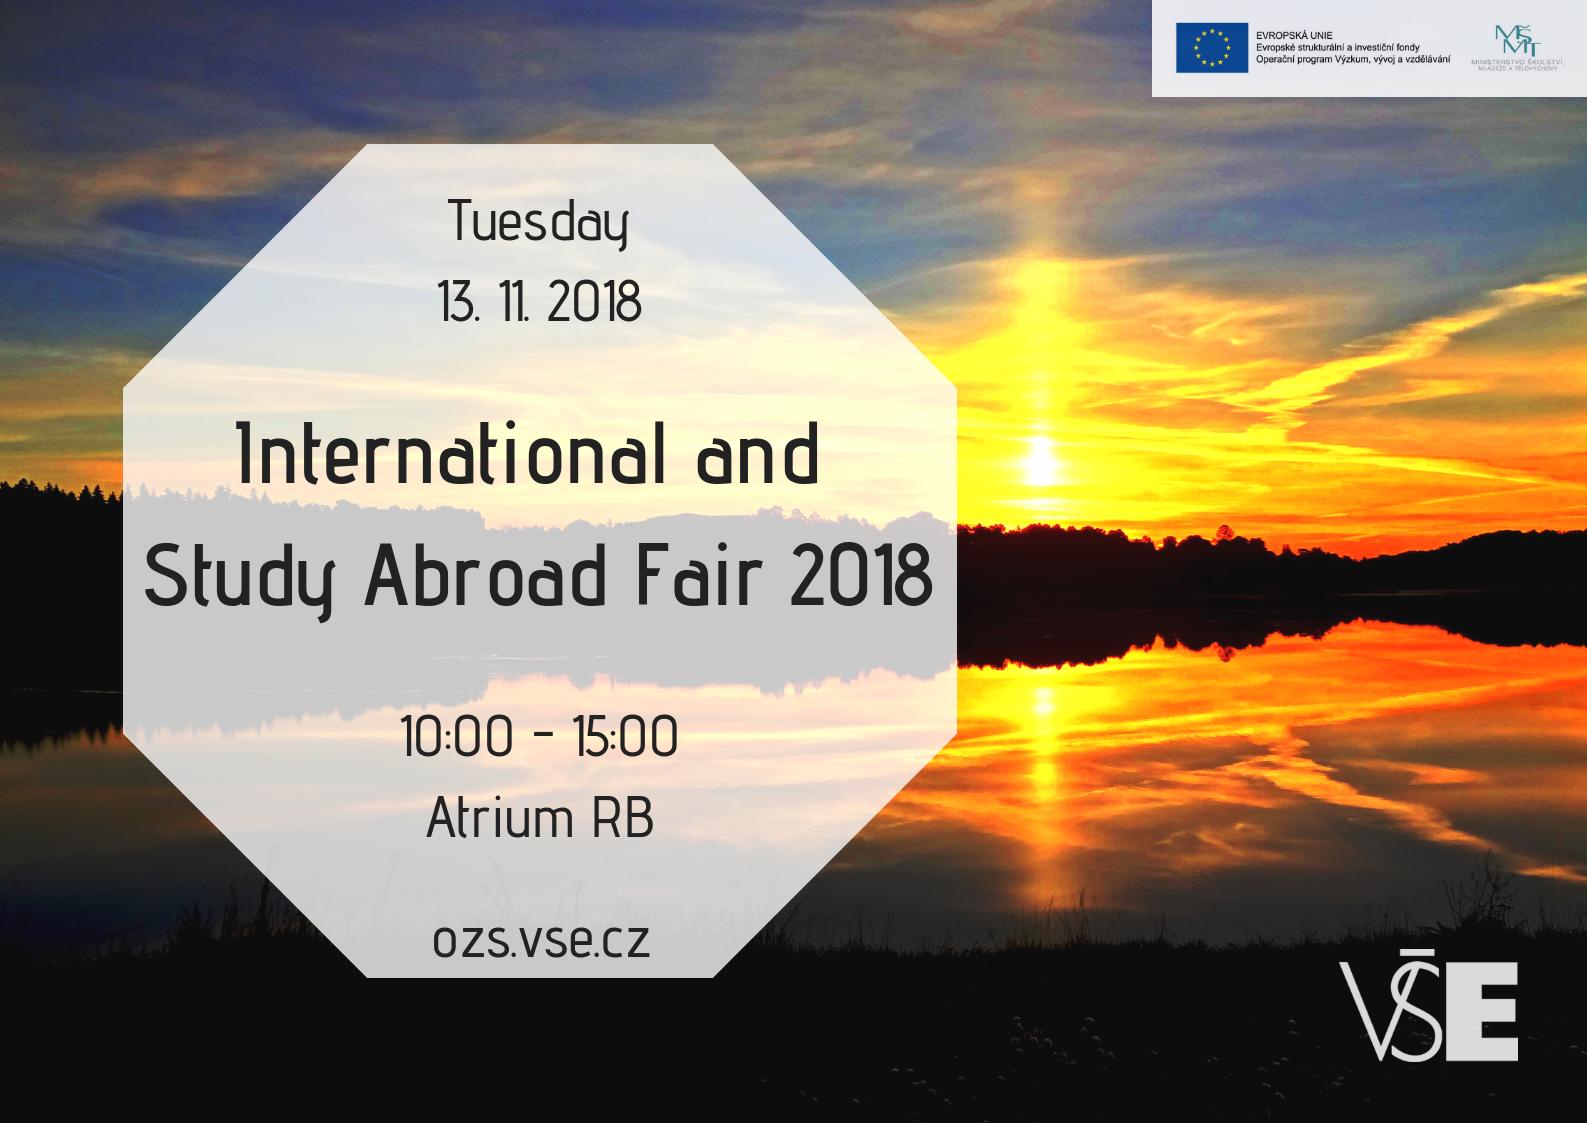 International & Study Abroad Fair 2018